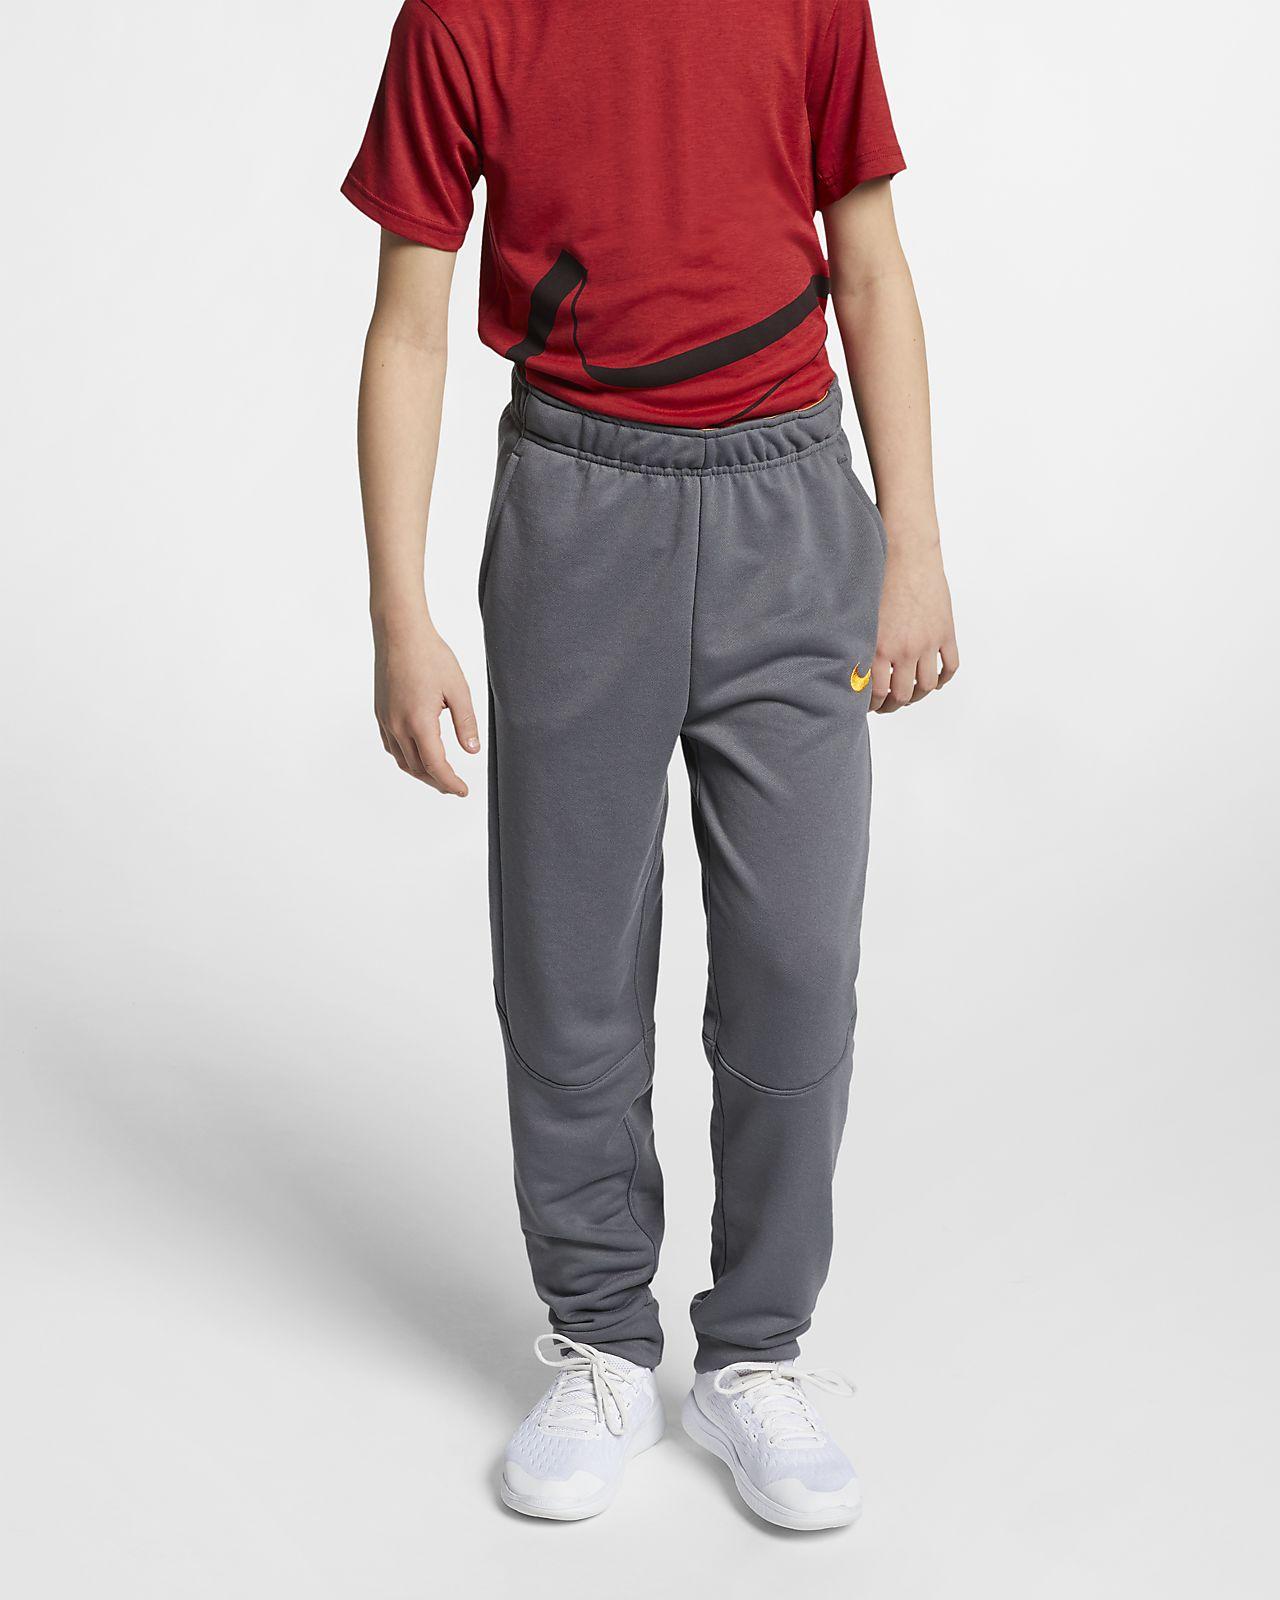 Nike Dri-FIT Older Kids' Training Trousers